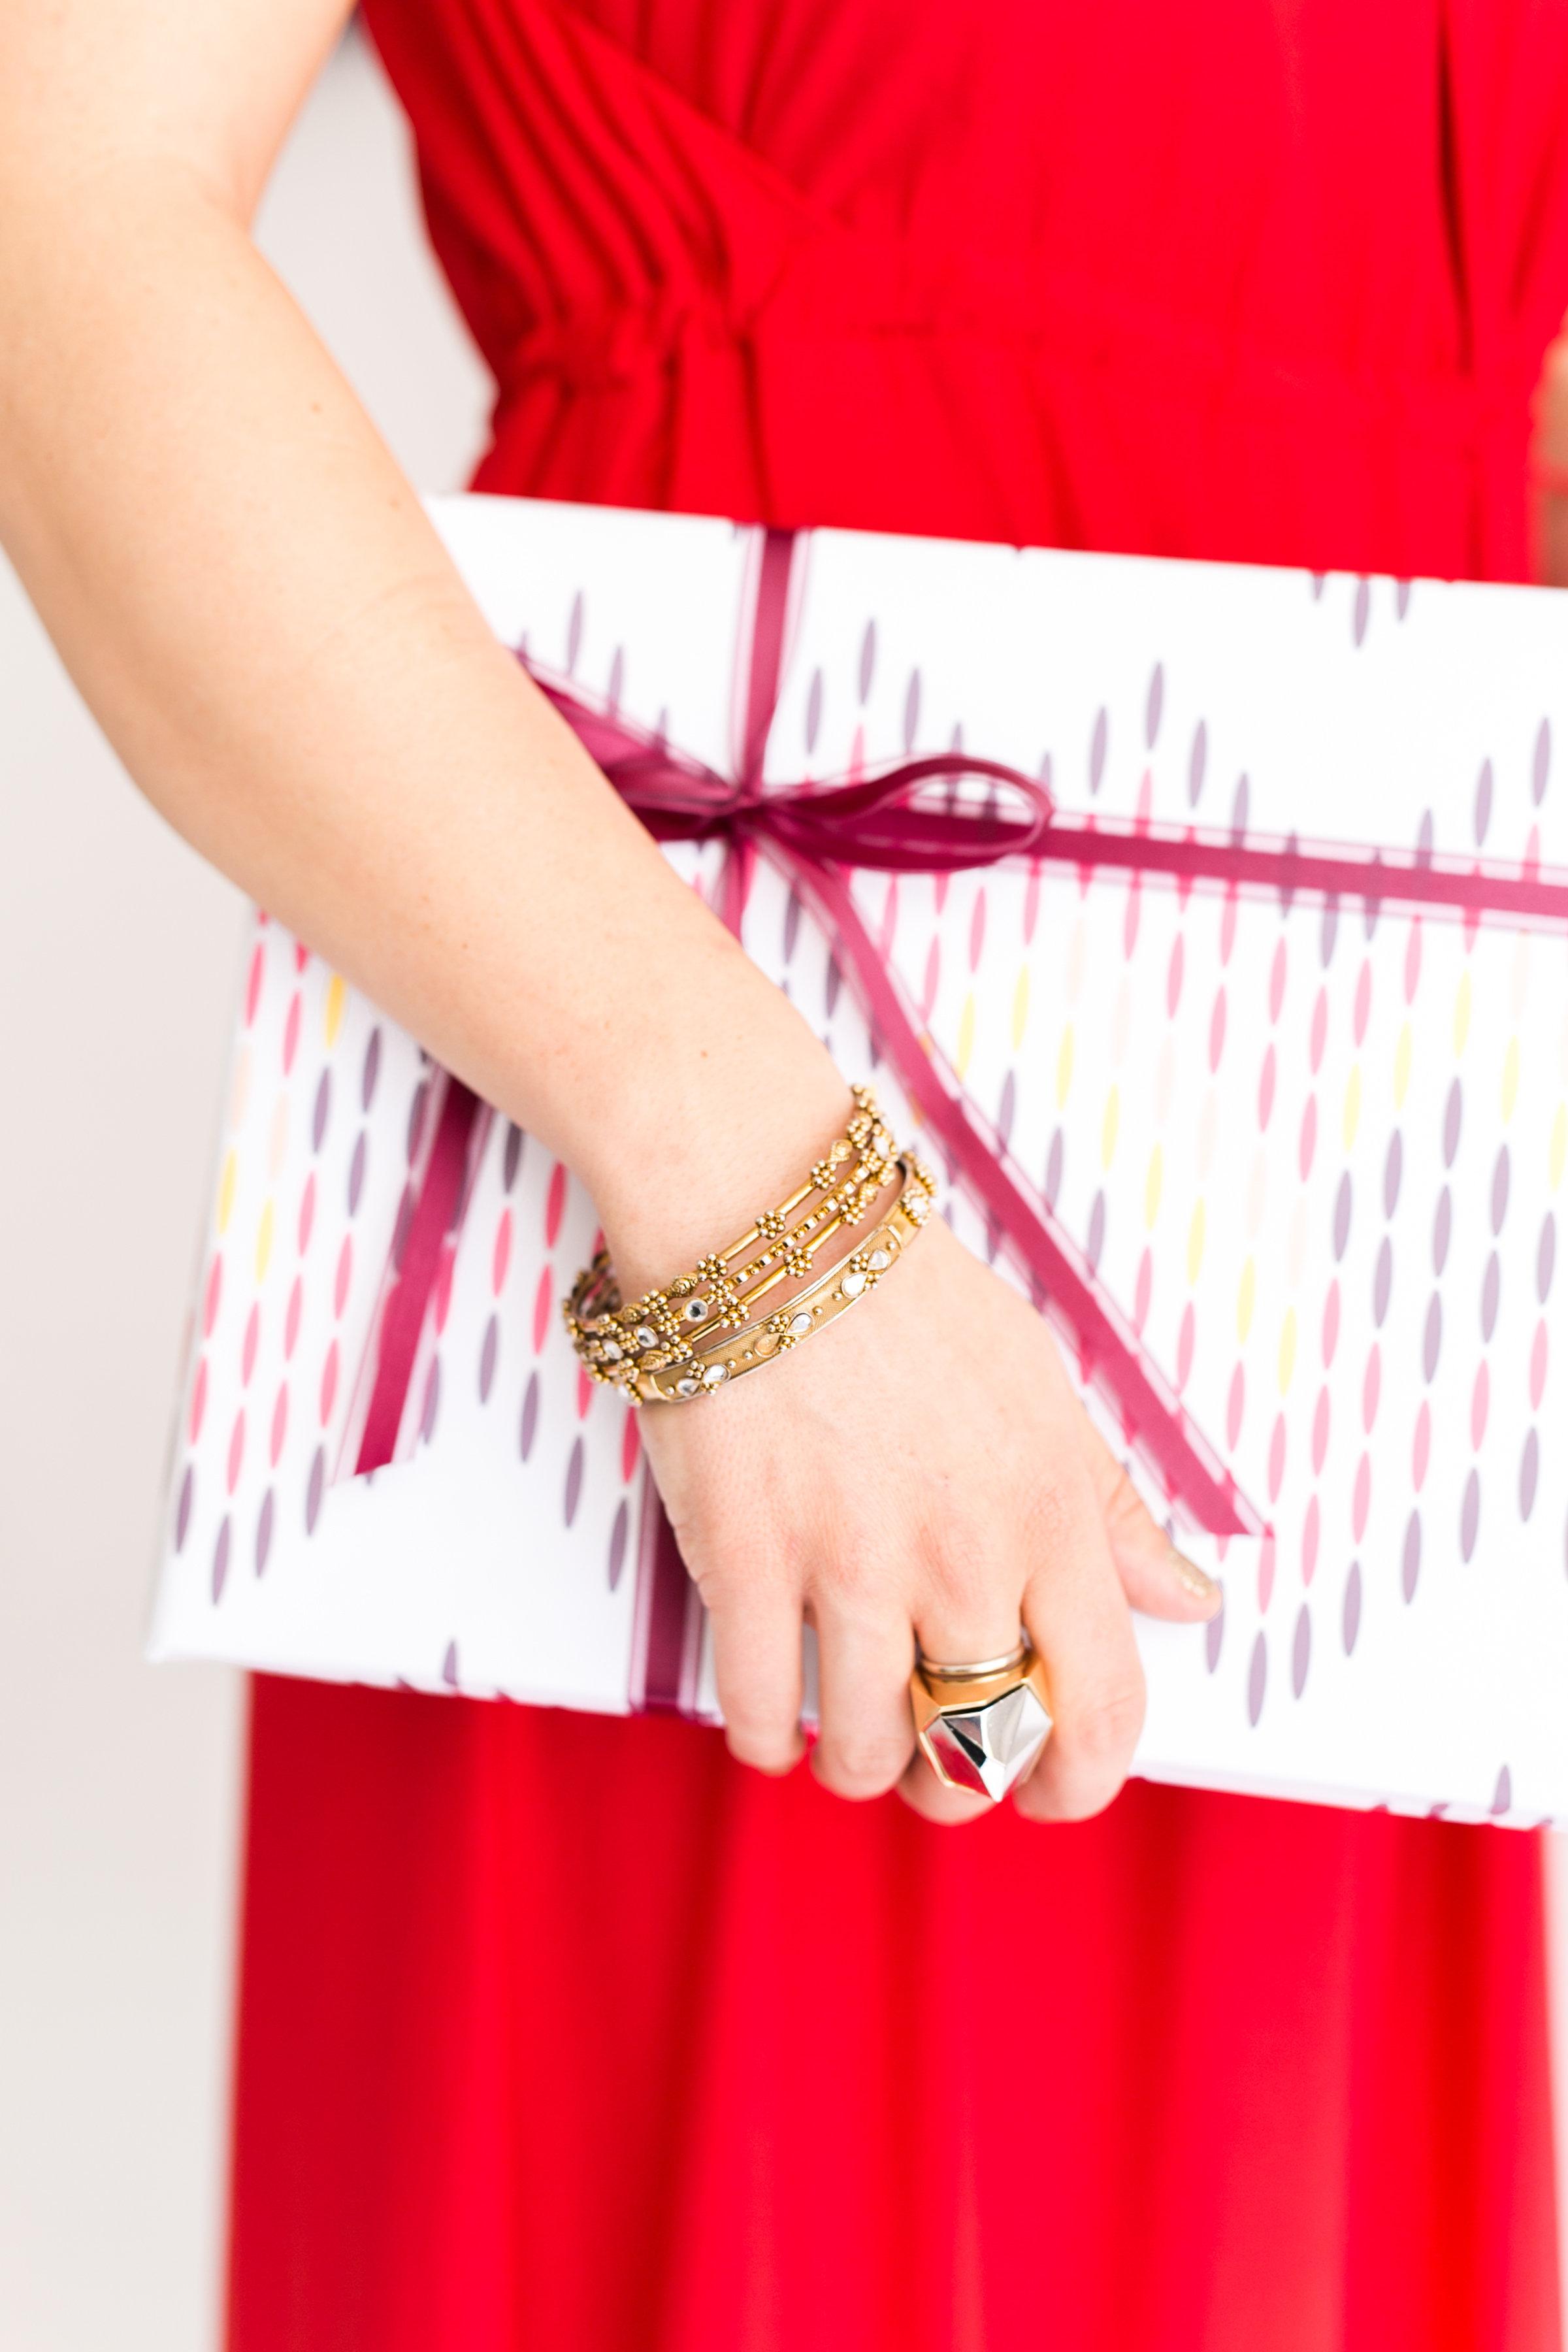 Flair Exchange Holiday 2015-Flair Exchange Holiday 2015-0014.jpg